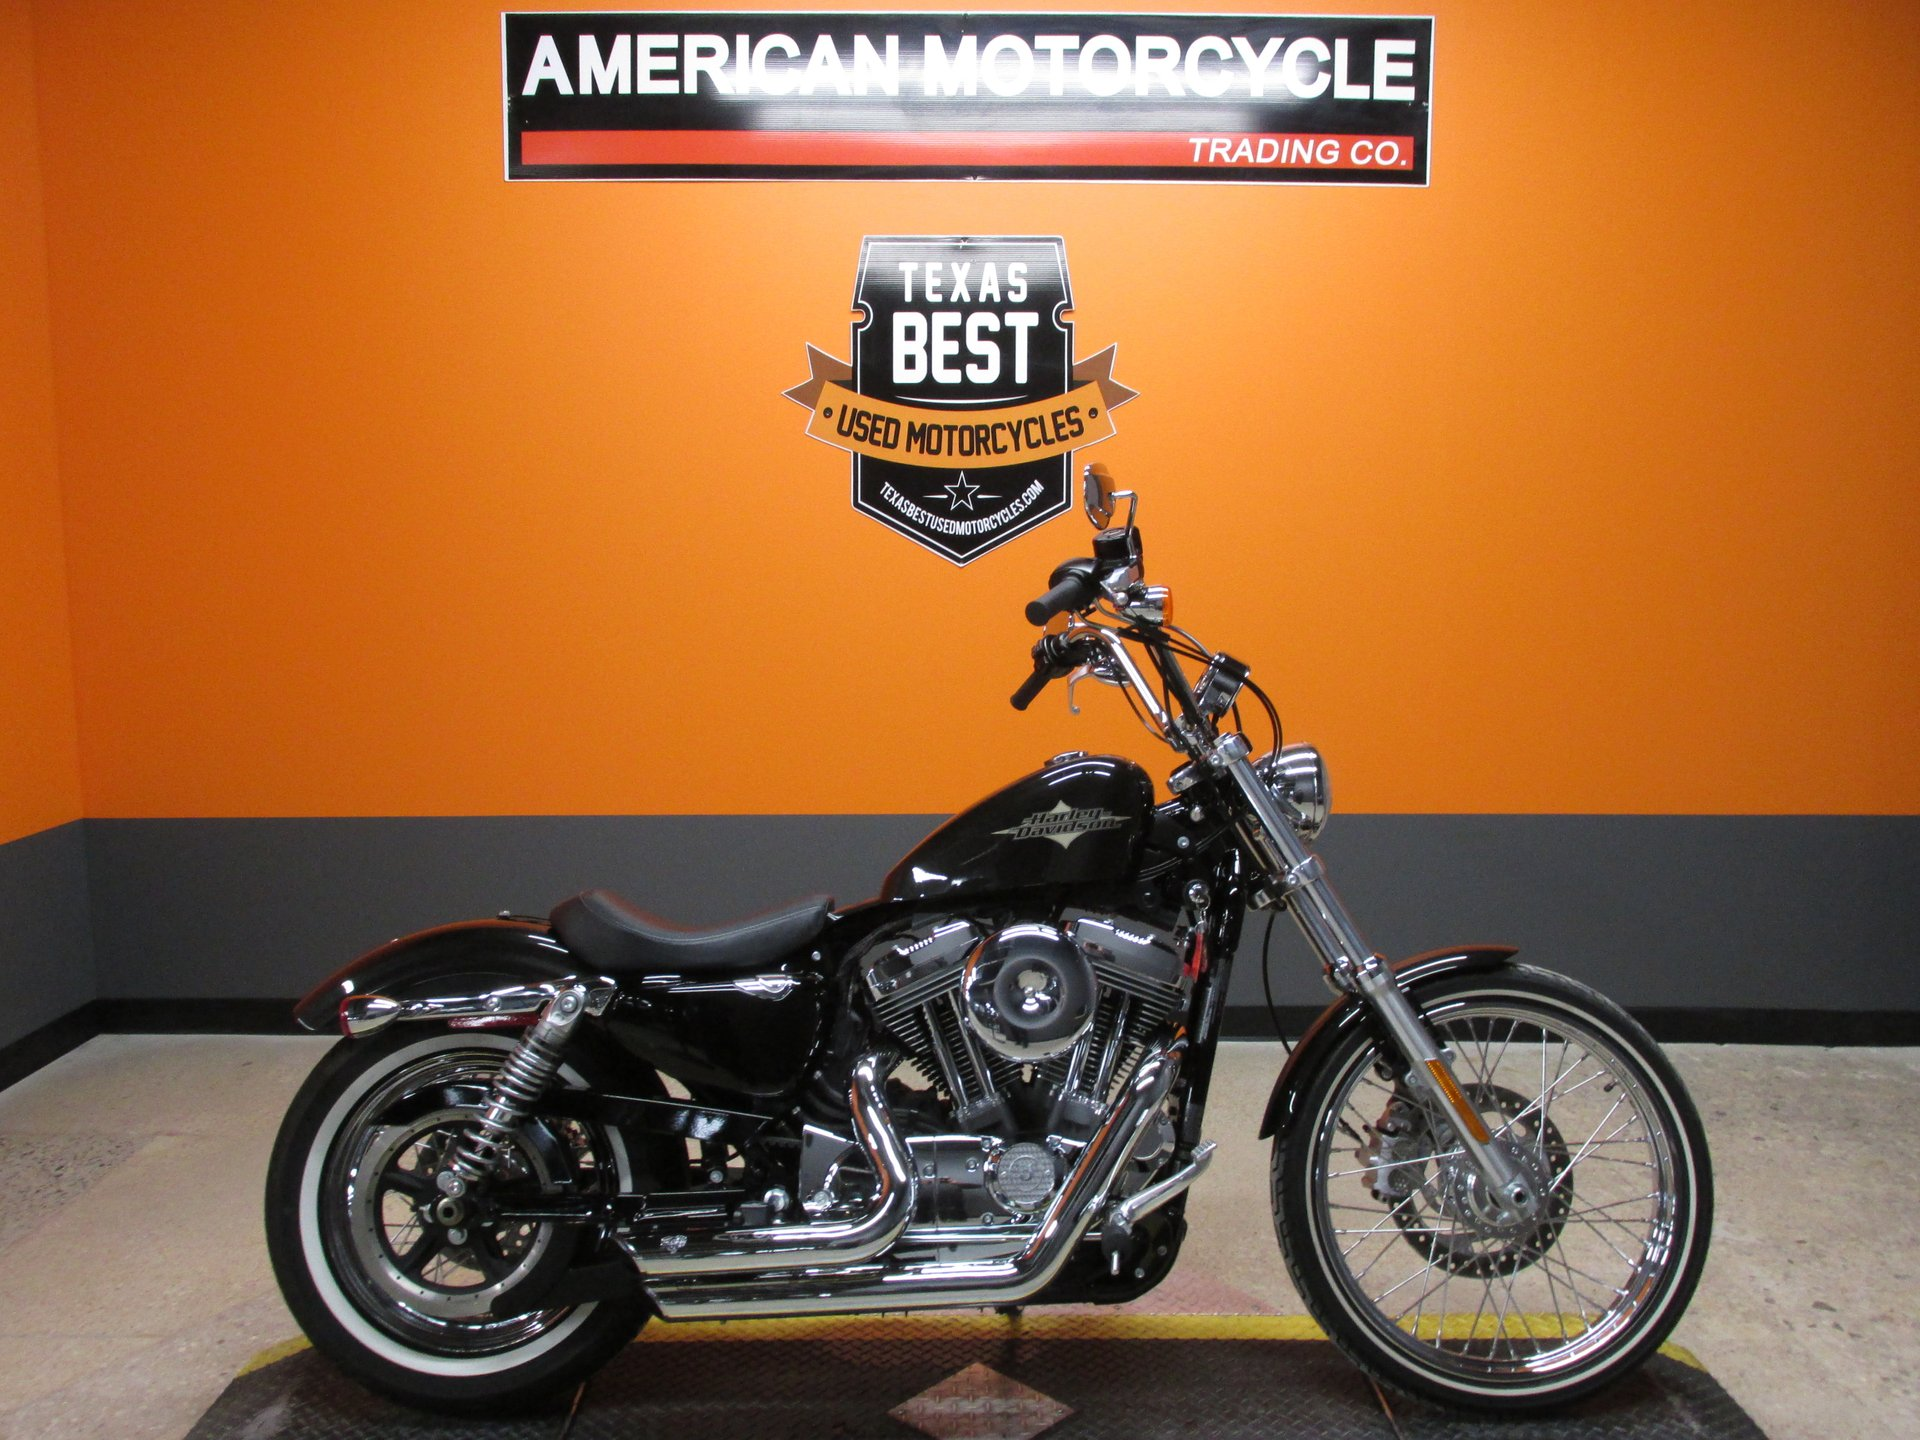 2016 Harley Davidson Sportster 1200 American Motorcycle Trading Company Used Harley Davidson Motorcycles